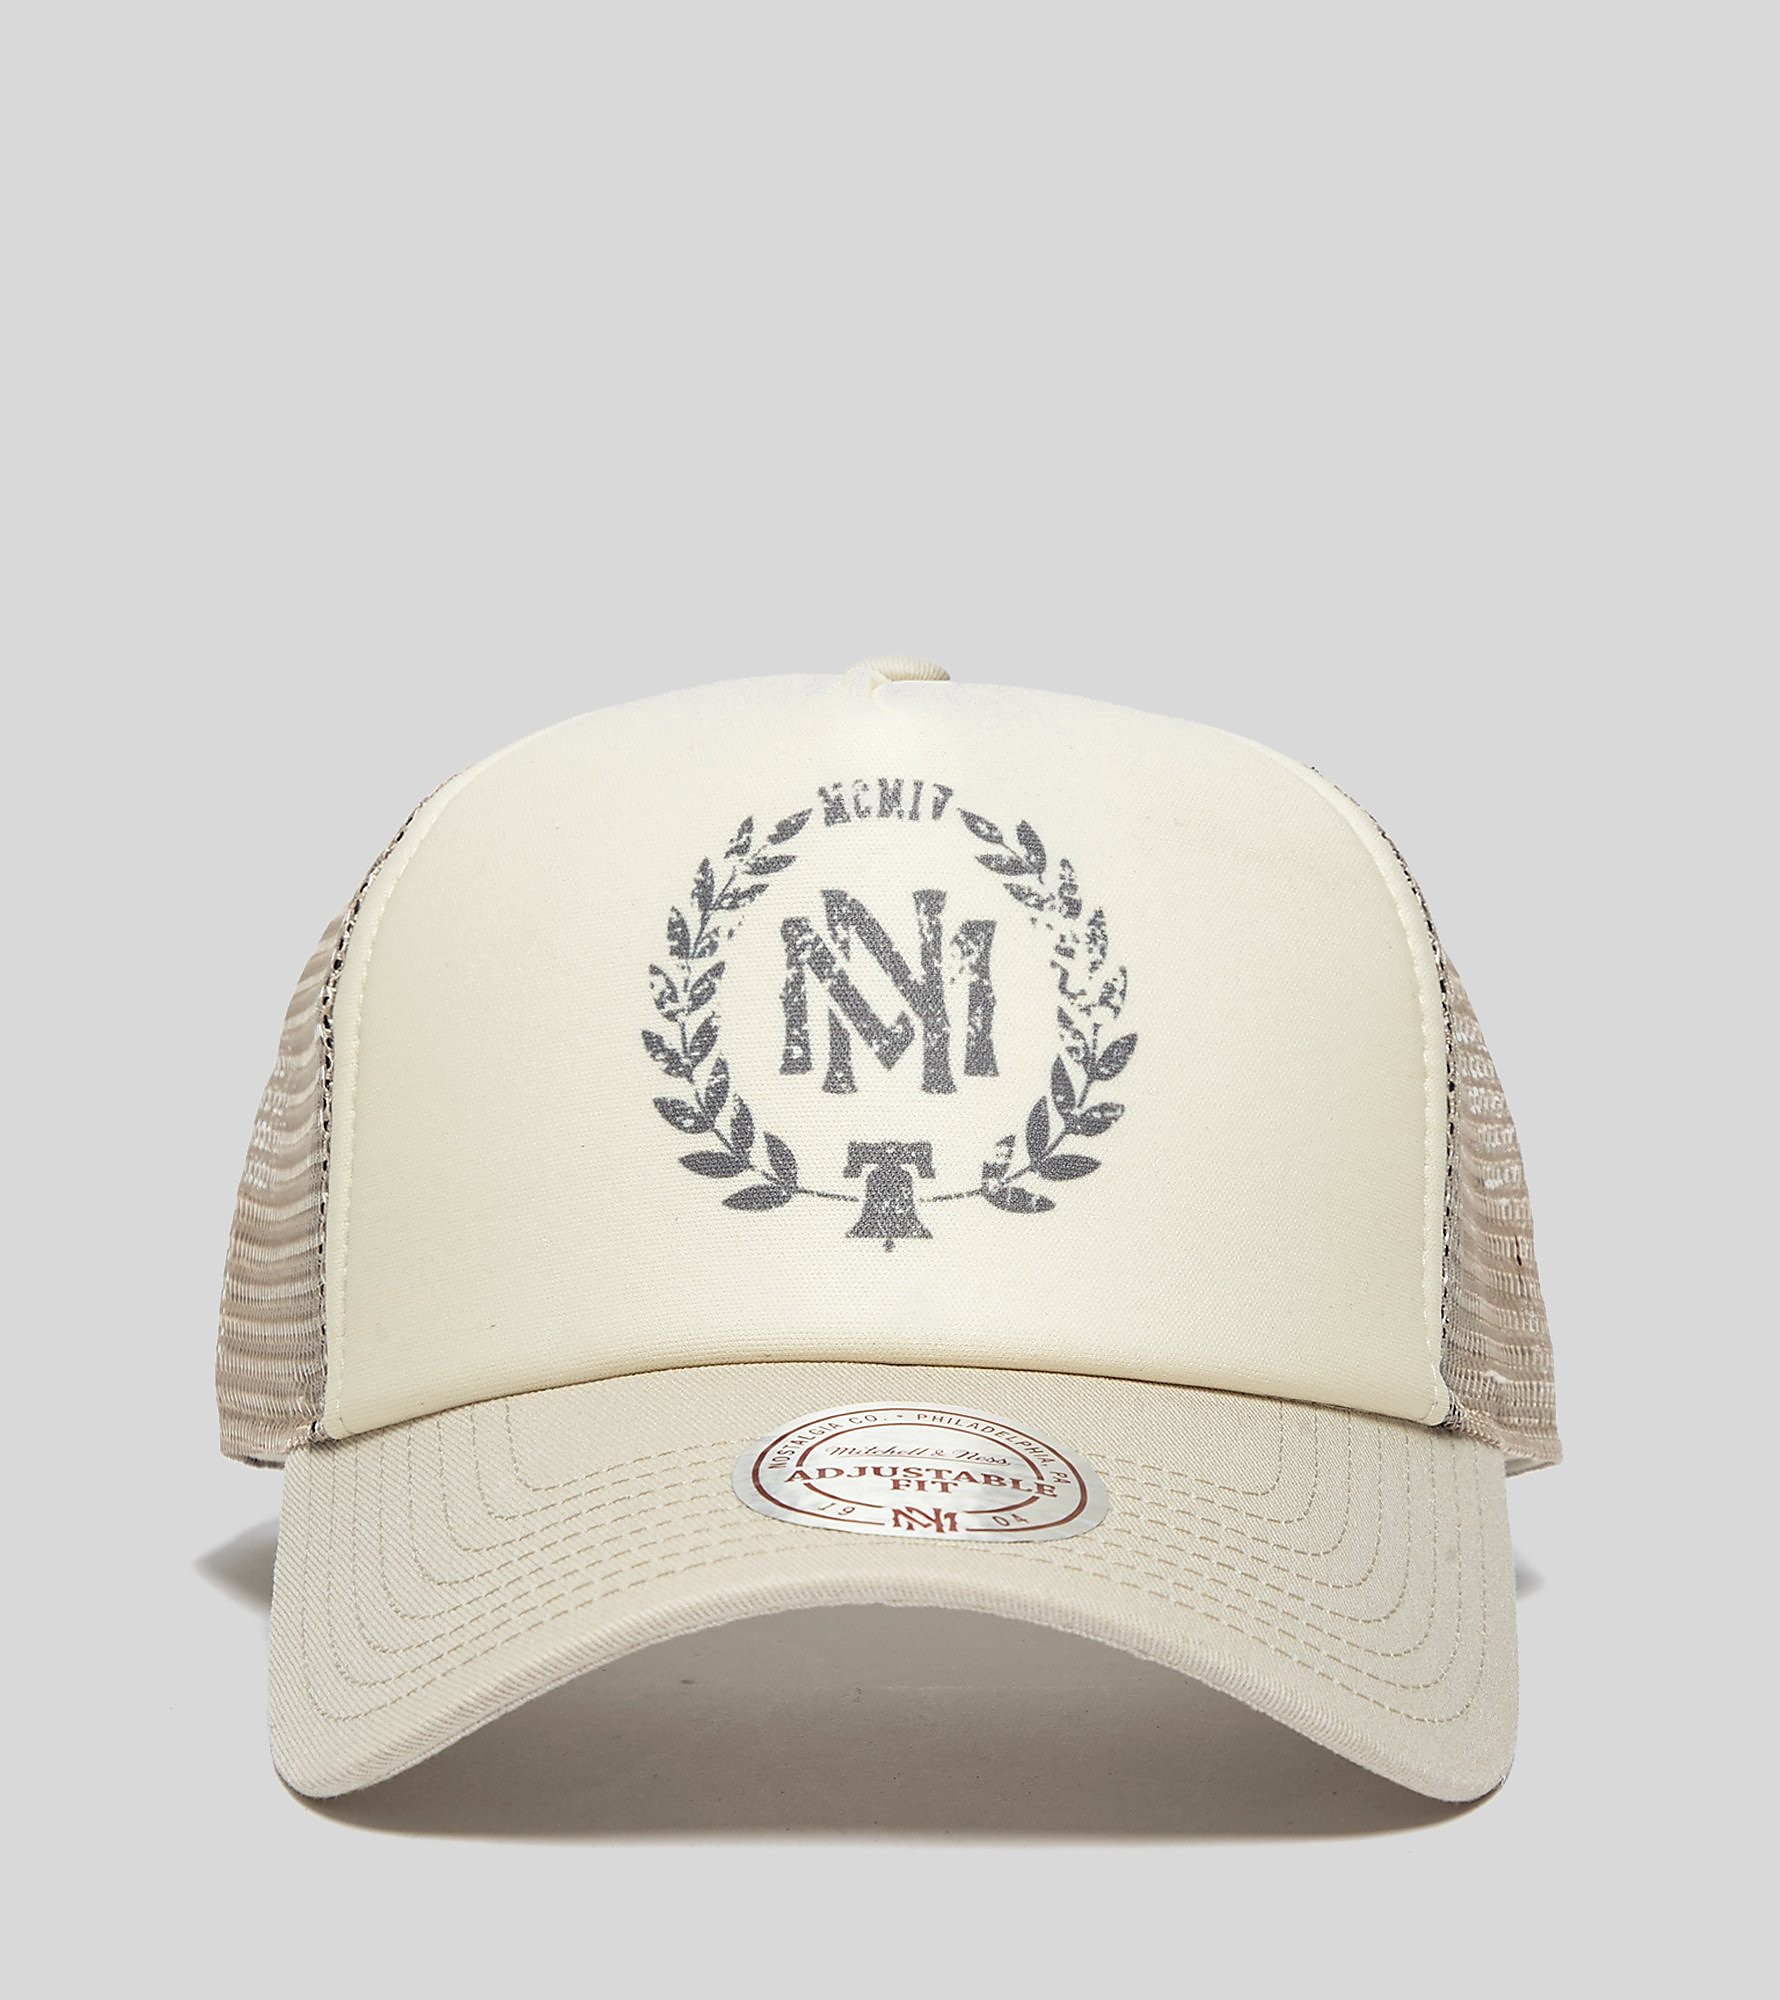 Mitchell & Ness Washed M&N Trucker